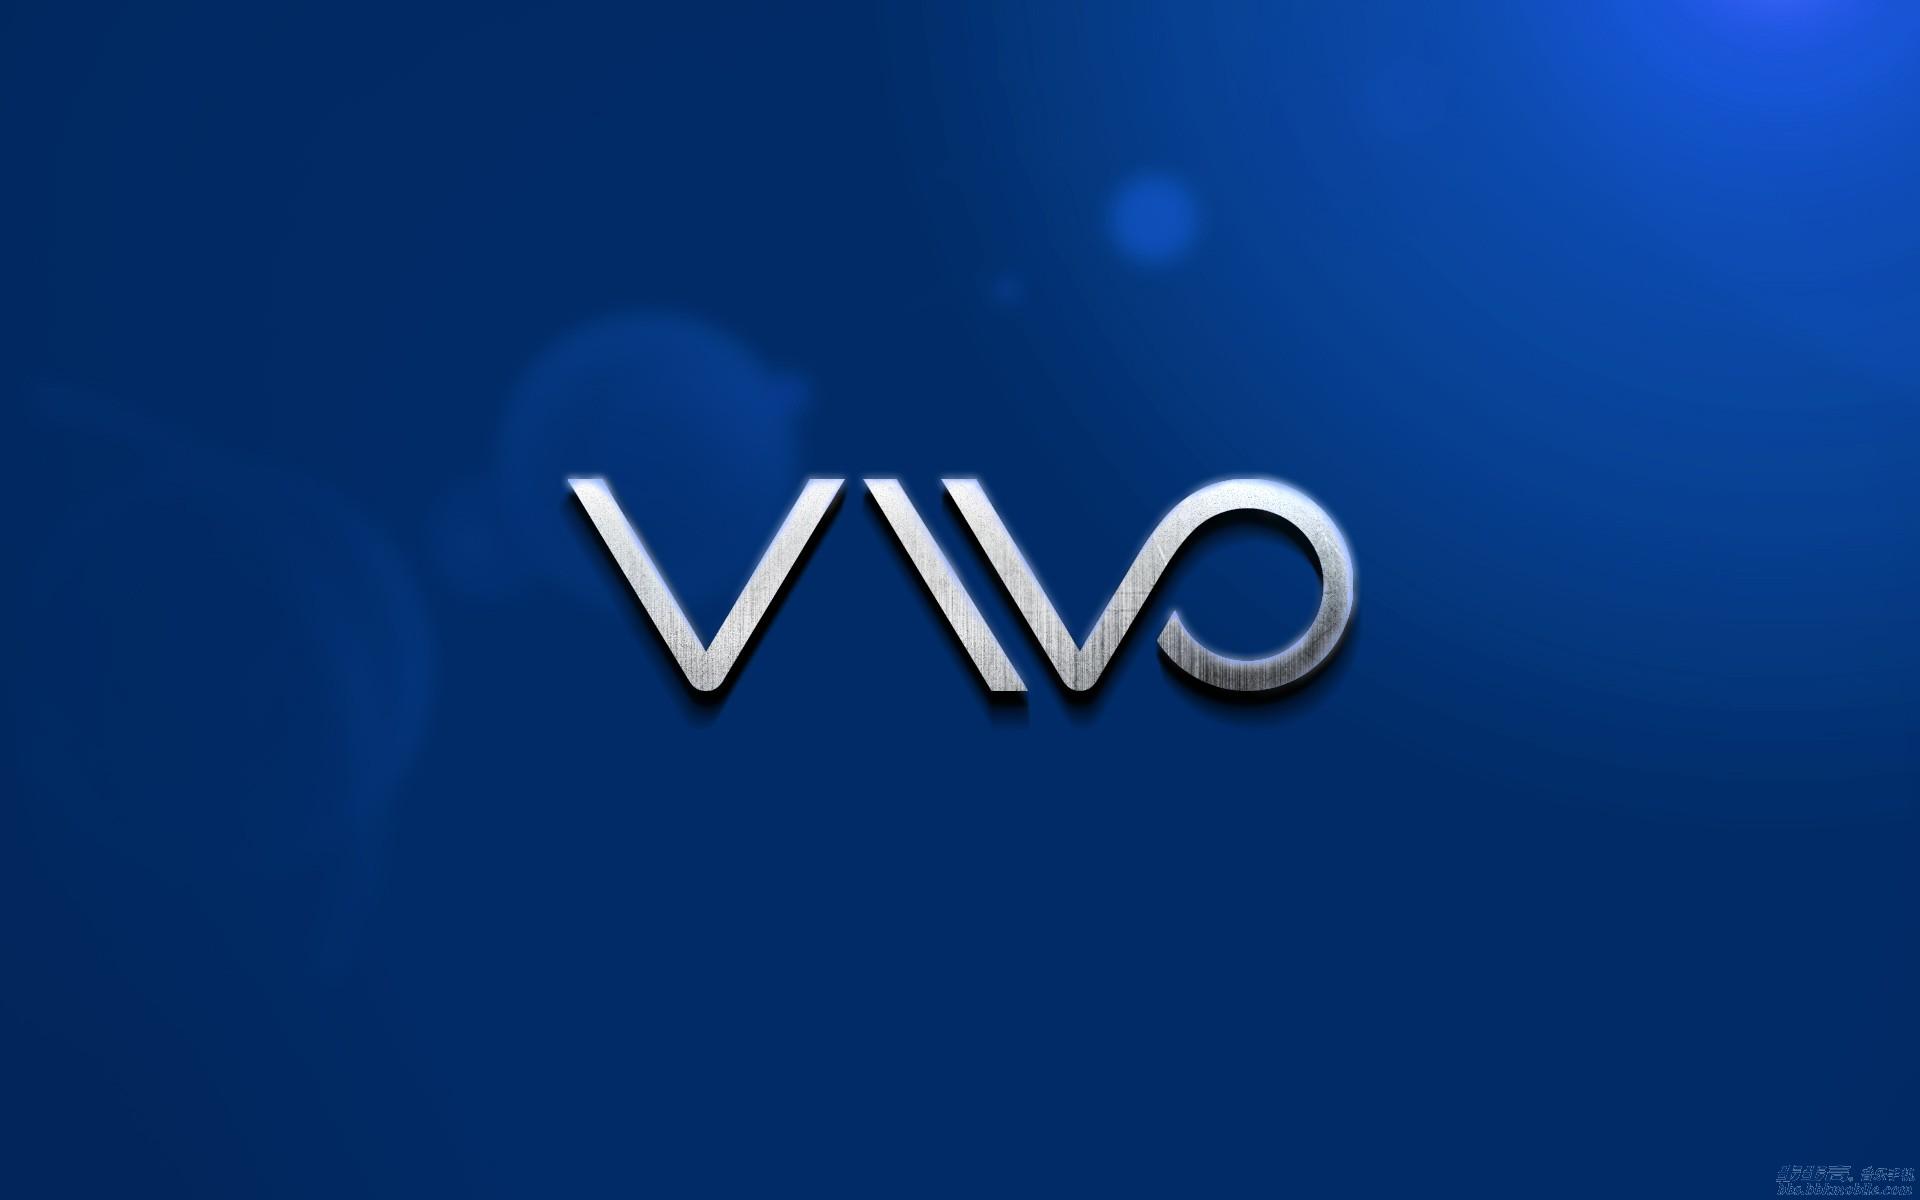 vivo logo新增风格(名字要长点才能看的见,据